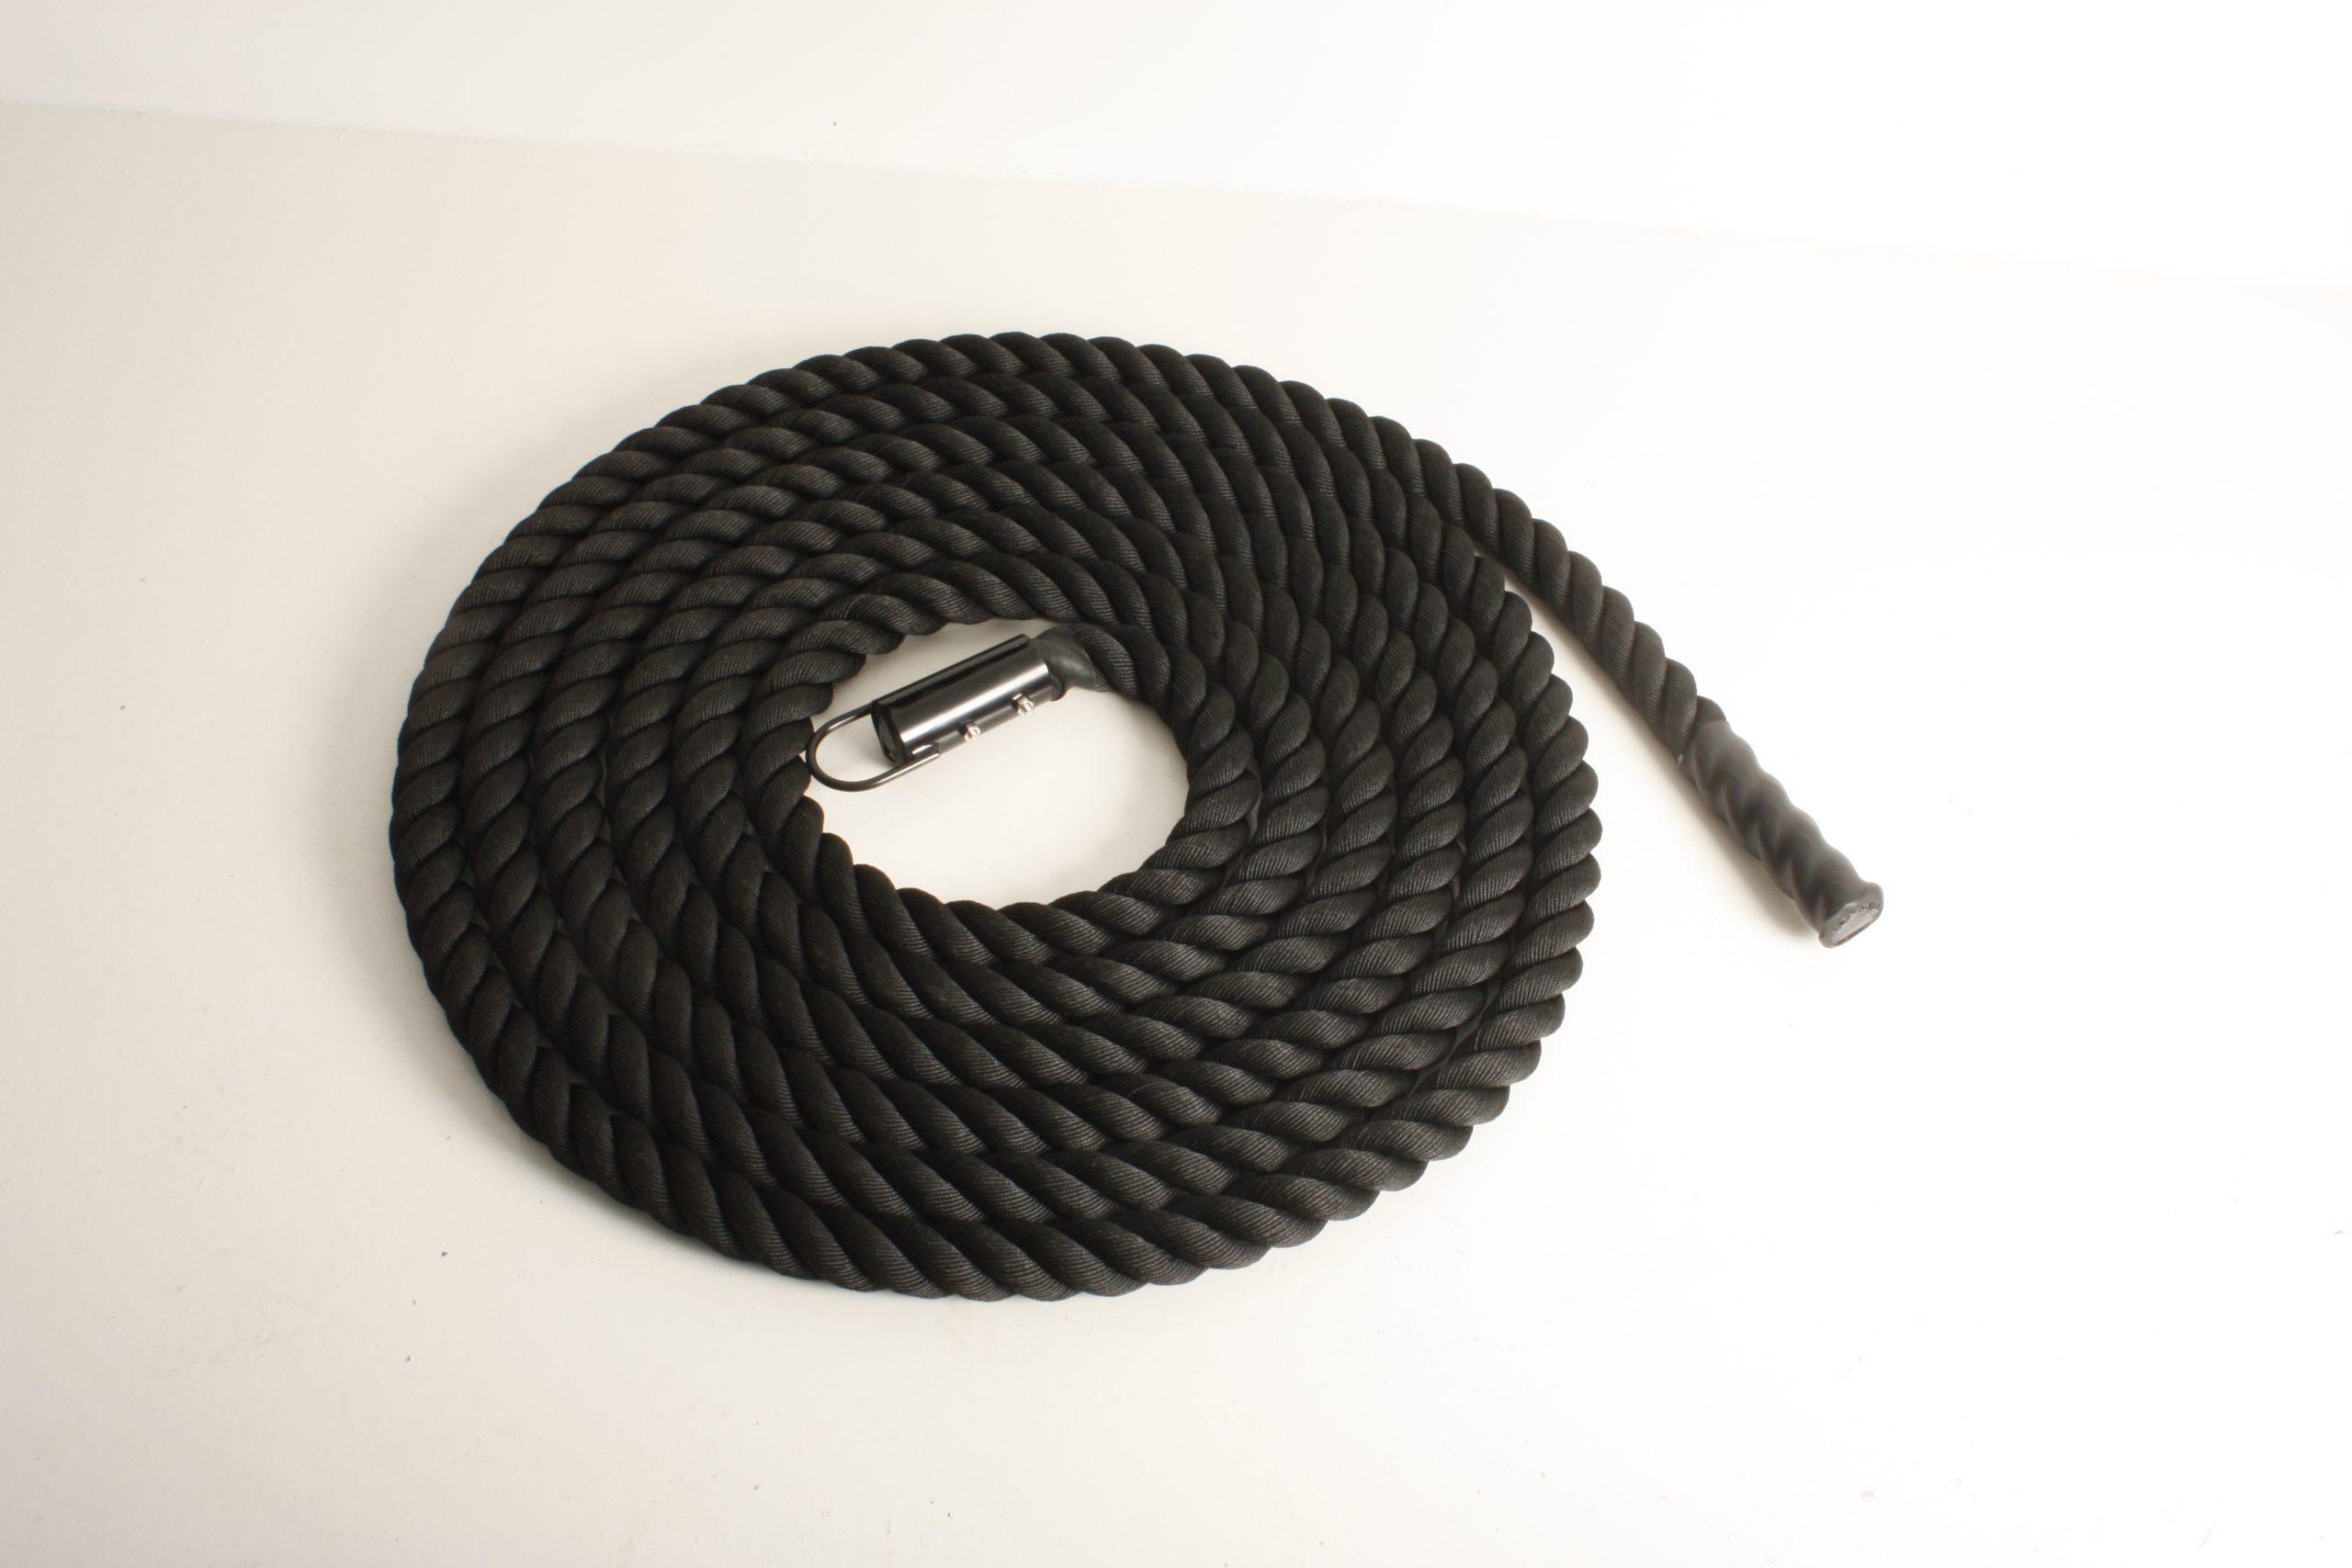 Battle rope treeniköysi 50 mm, 12 m